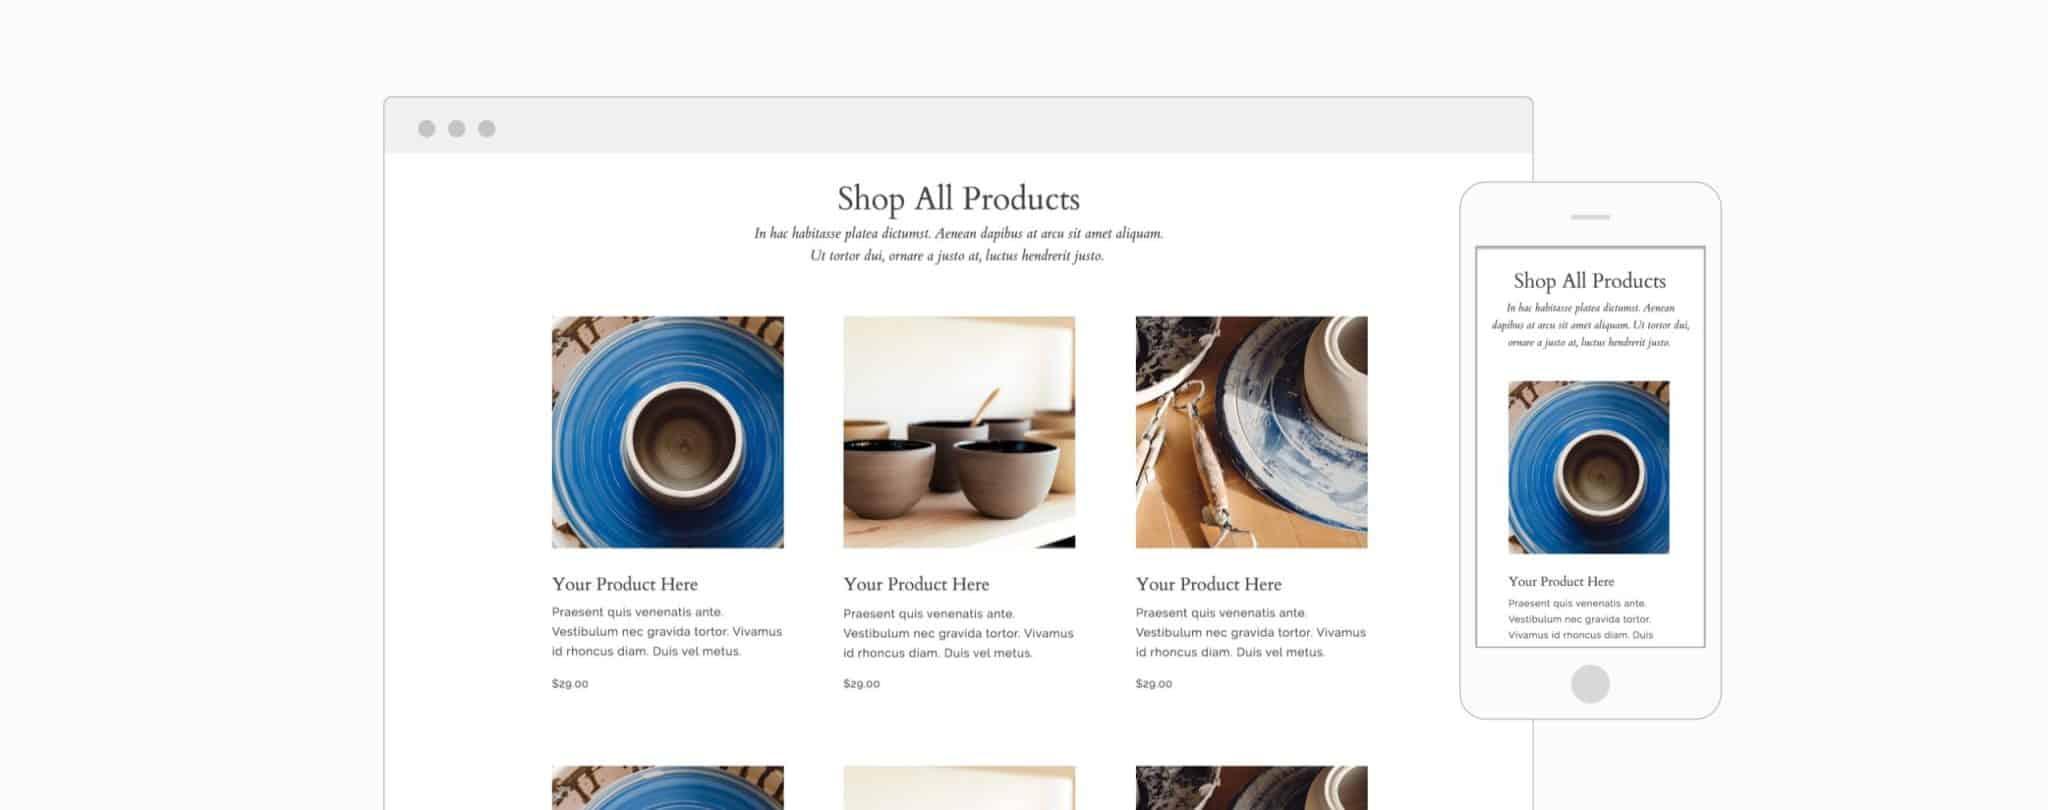 Product Header - SouthportShopPage2